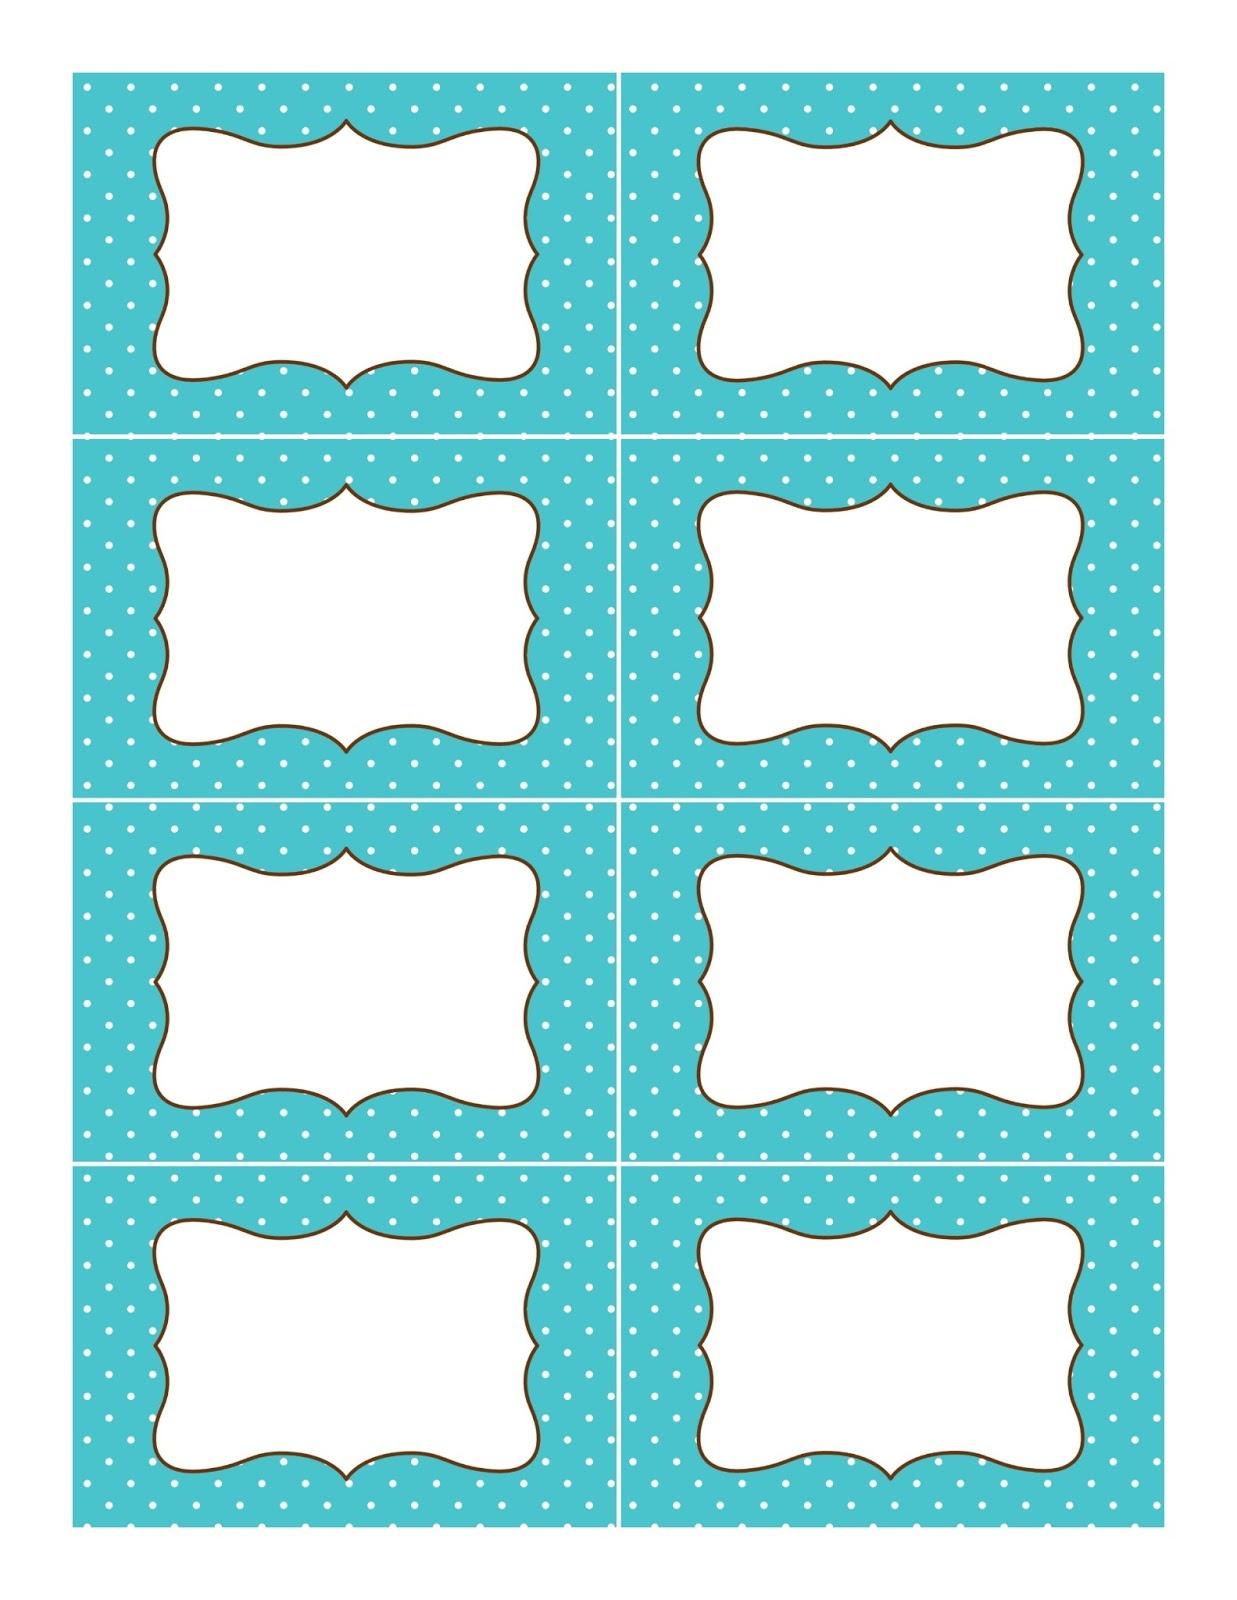 Pincrystal Long On Sweet Bar Buffet   Printable Labels, Candy - Free Editable Printable Labels